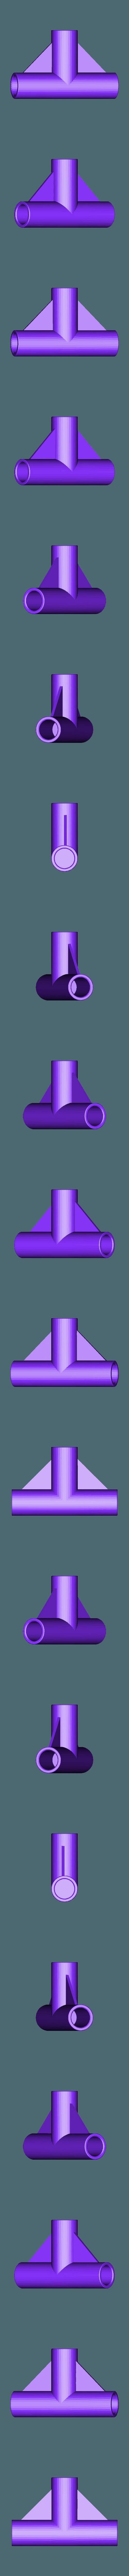 T-St%C3%BCck_dm22.stl Download free STL file Corner connector for garden tent • 3D printer template, gobo38